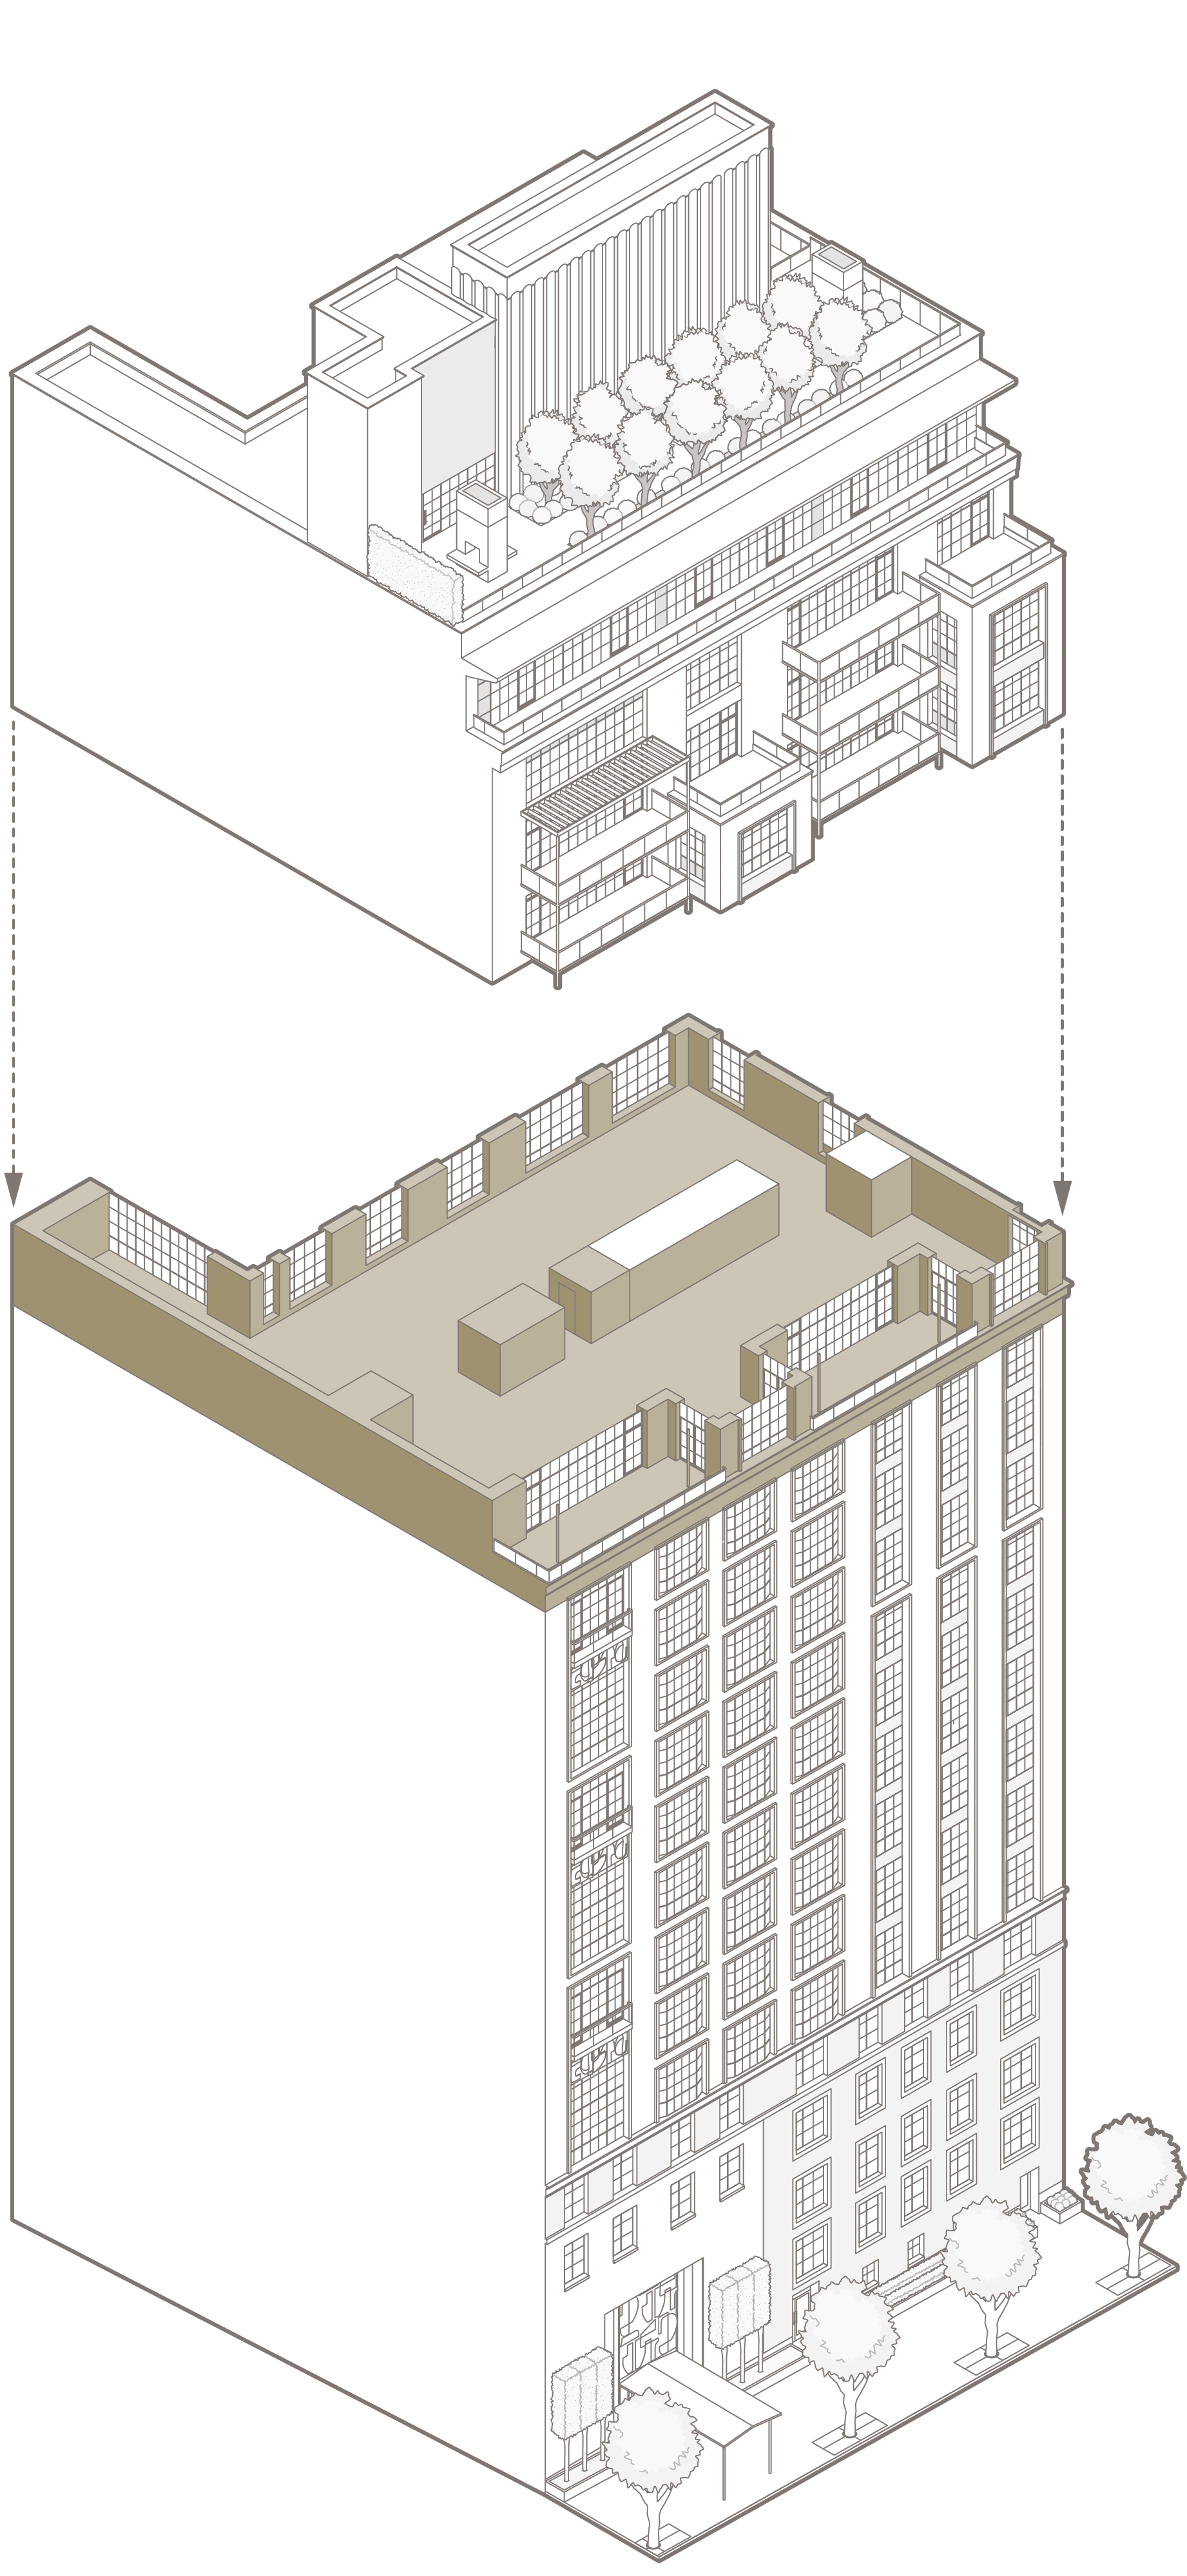 Penthouse 16 – South elevation